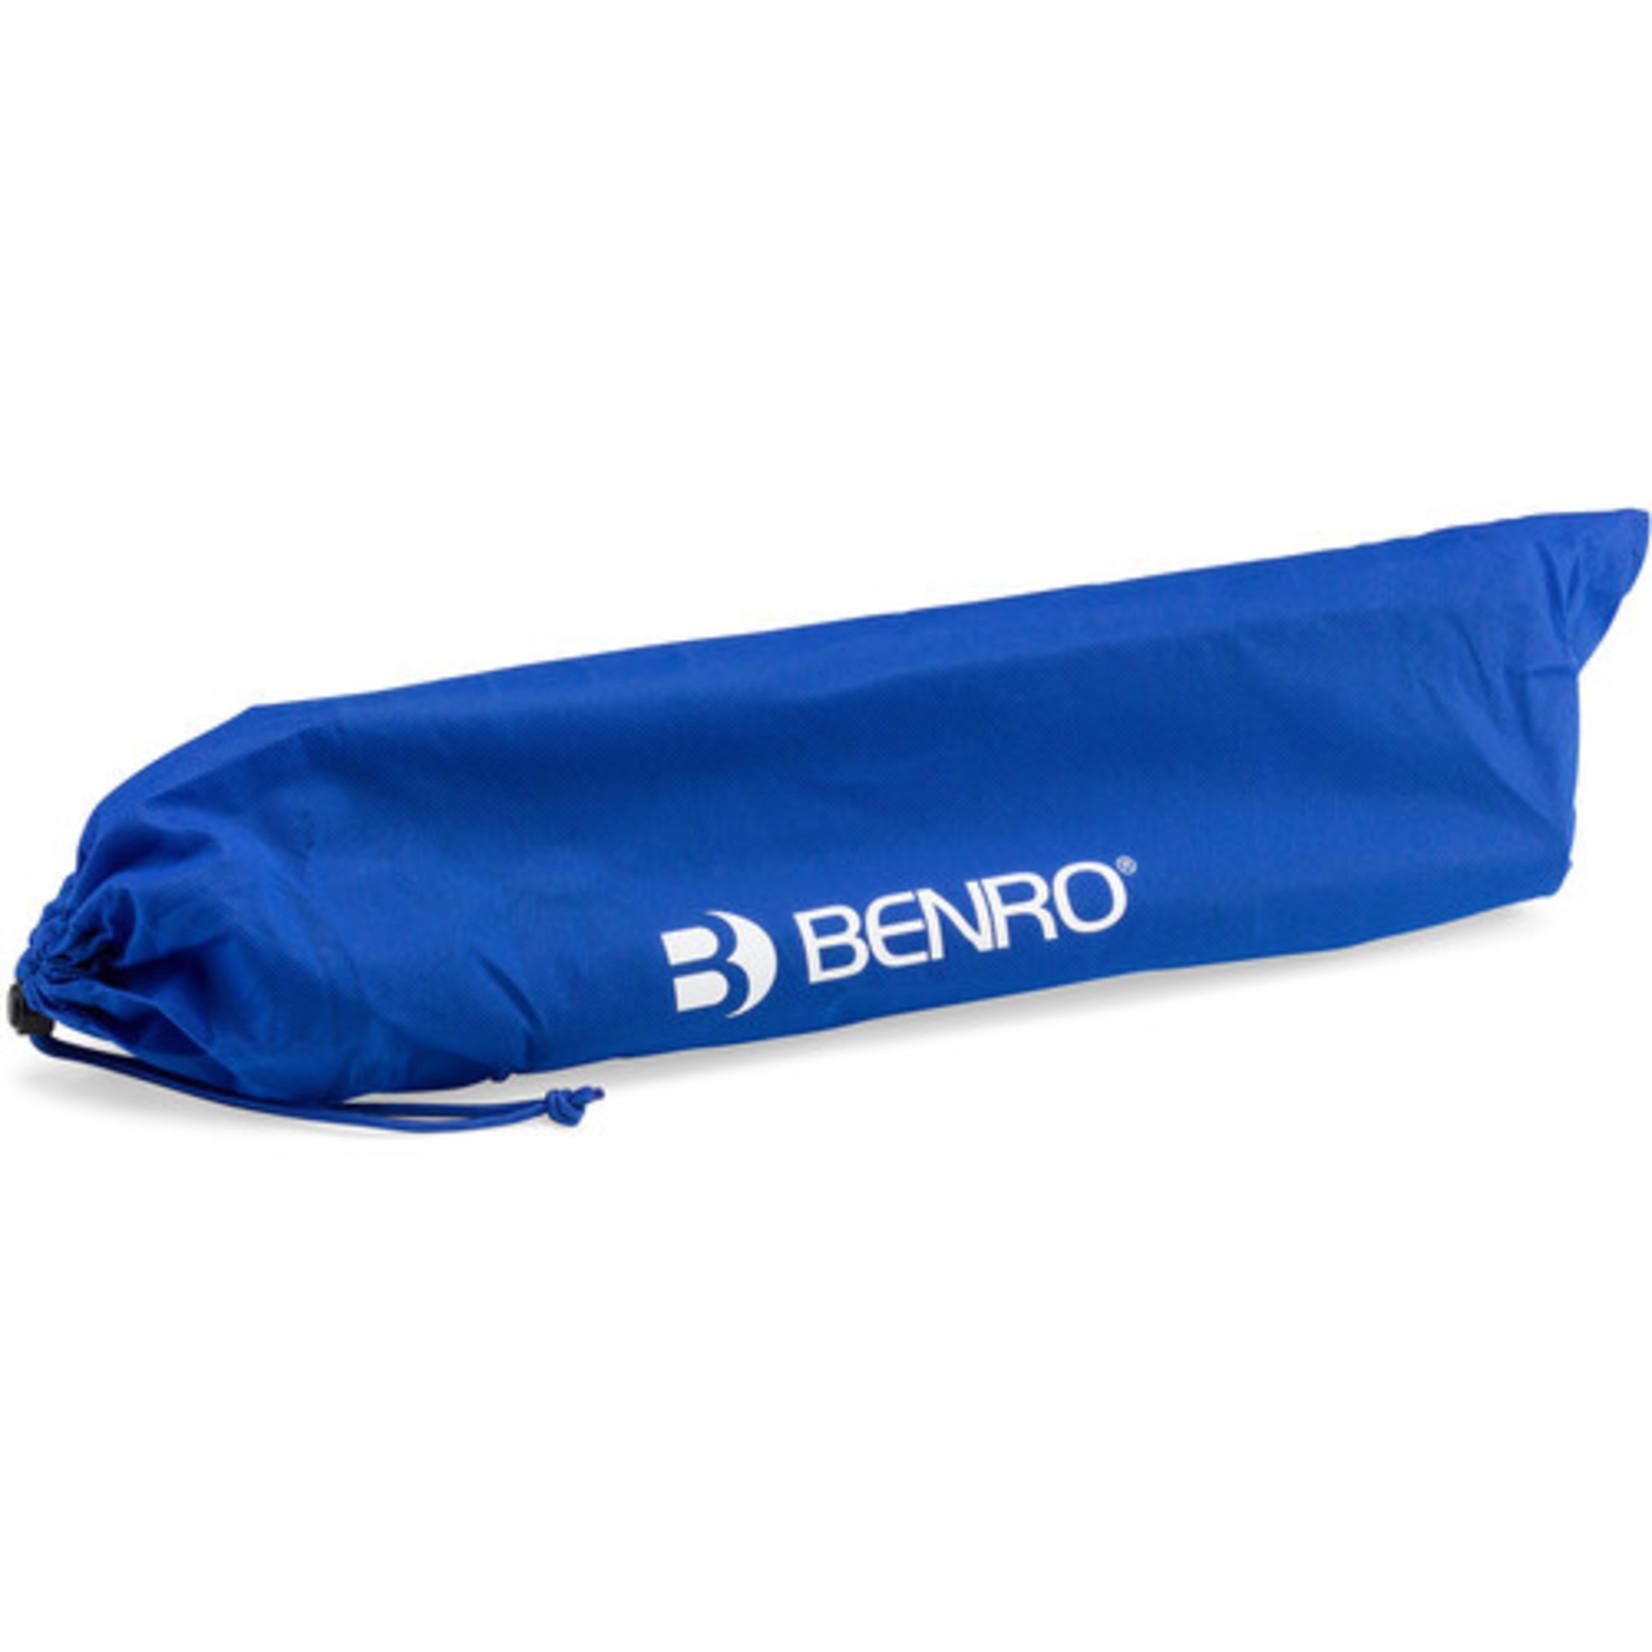 Benro Benro FTA18AB0 Travel Angel Series 1 Aluminum Tripod with B0 Ball Head